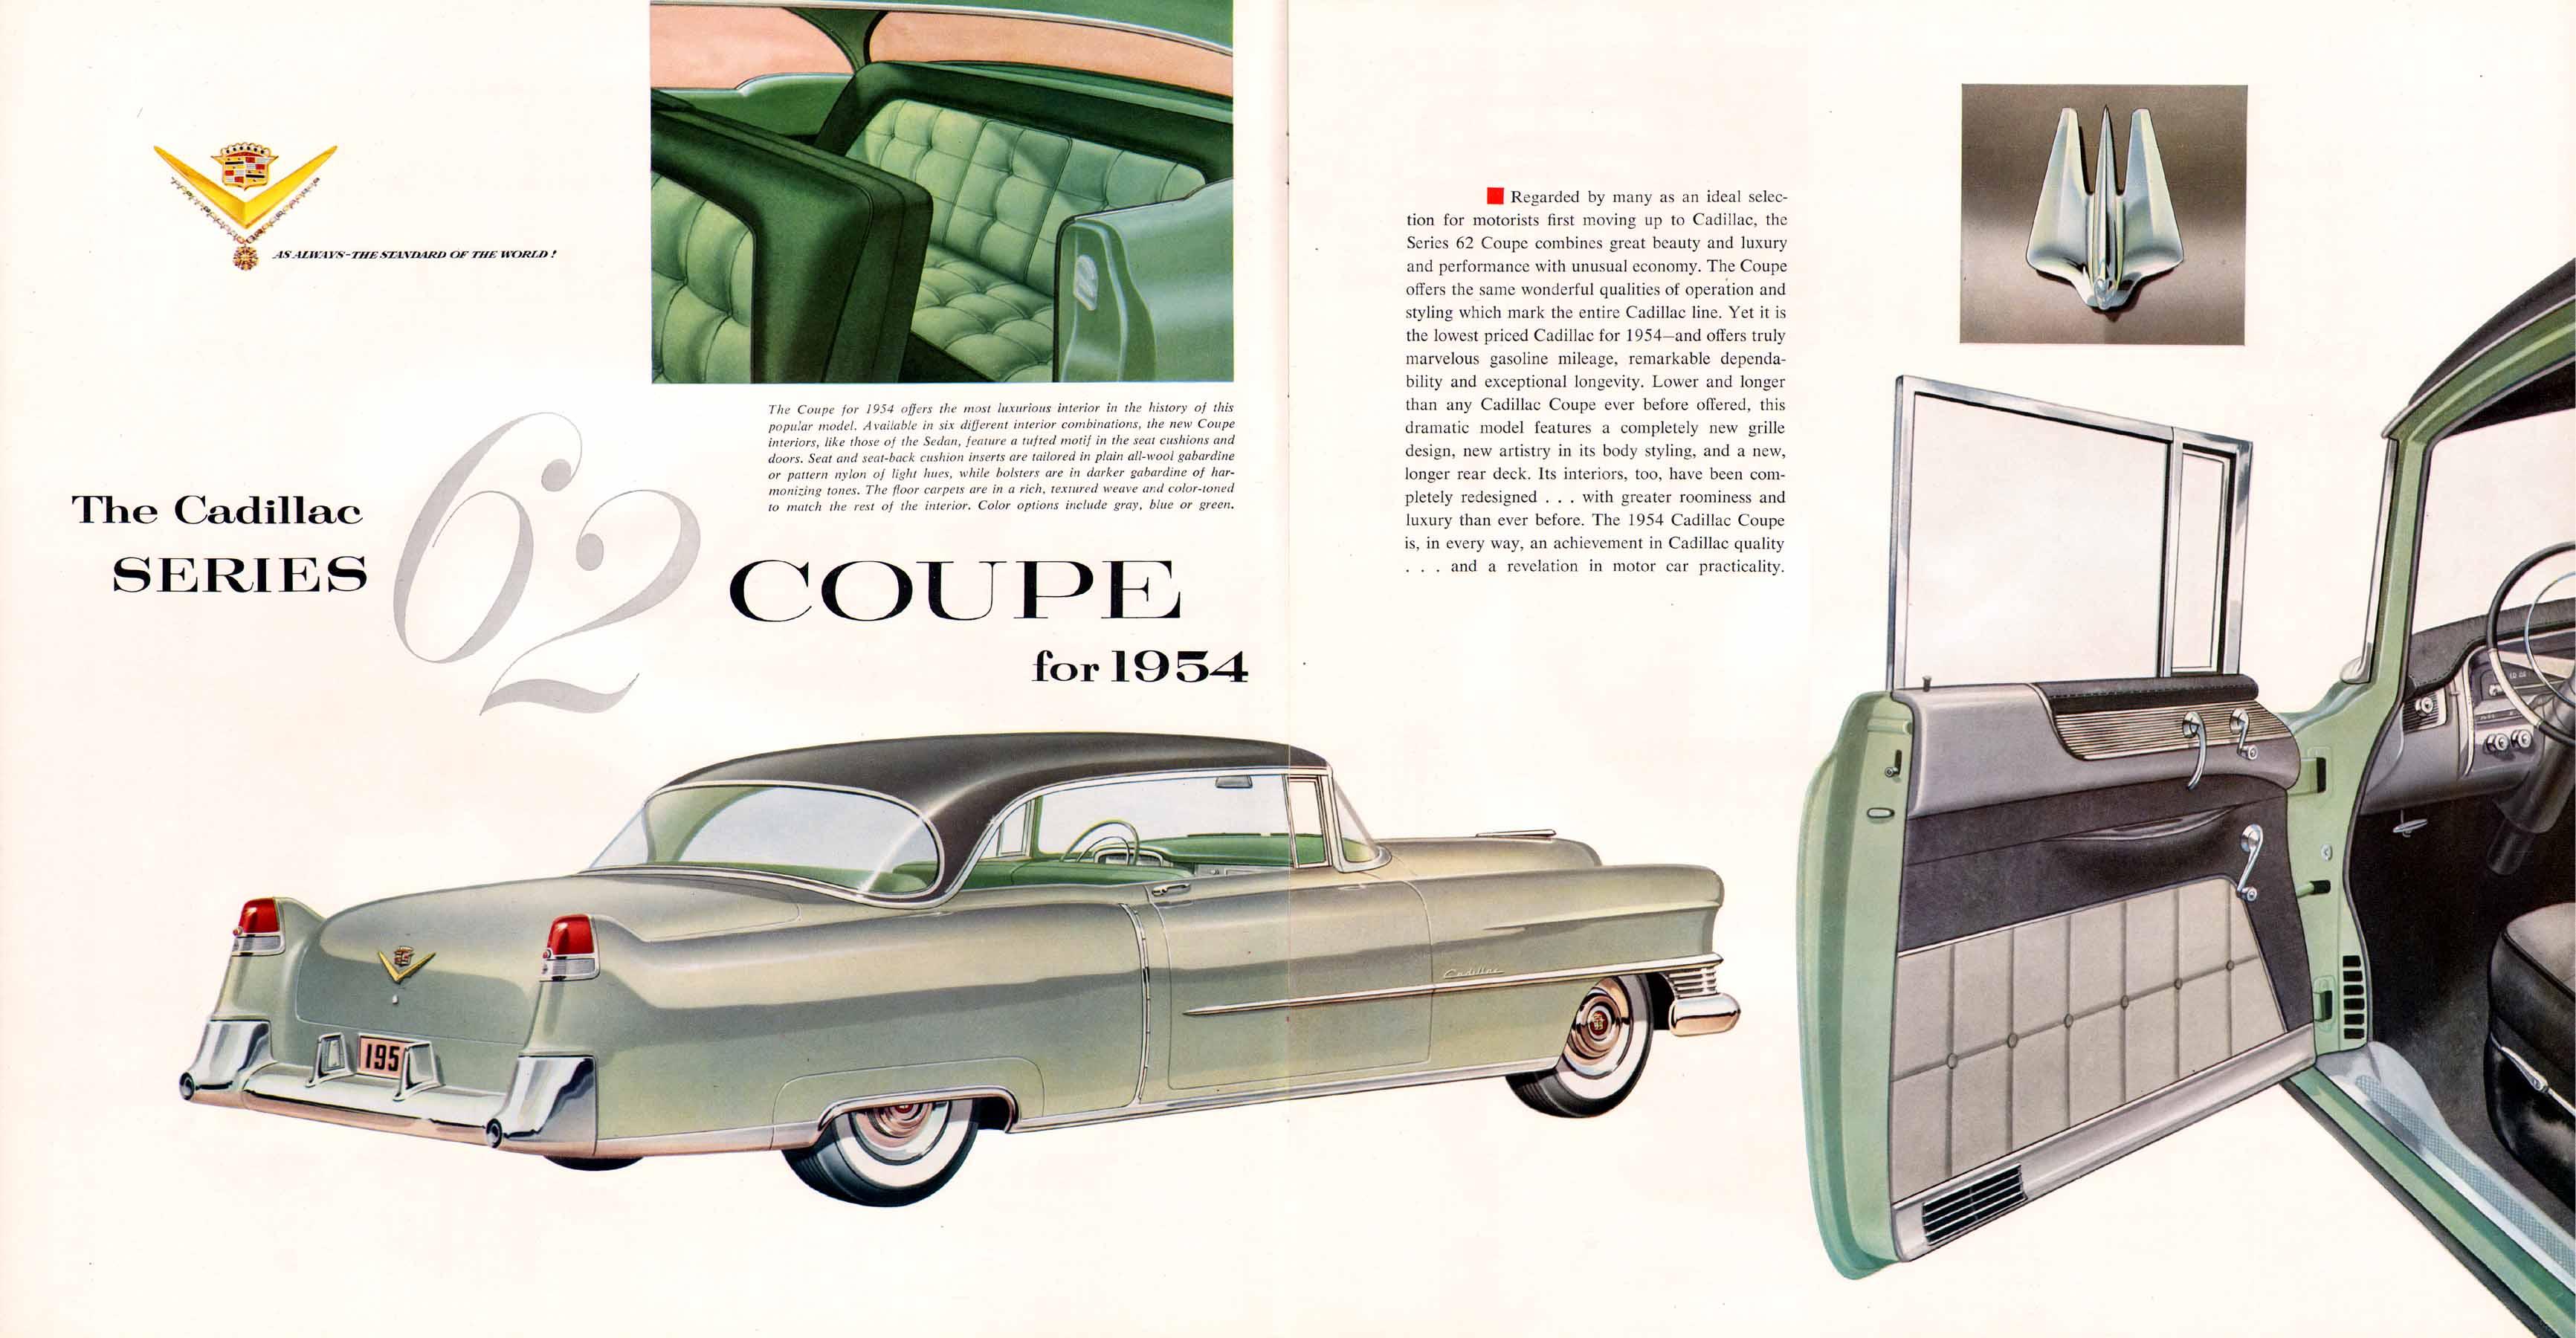 Image: 1954 Cadillac Brochure/1954 Cadillac Brochure-13-14